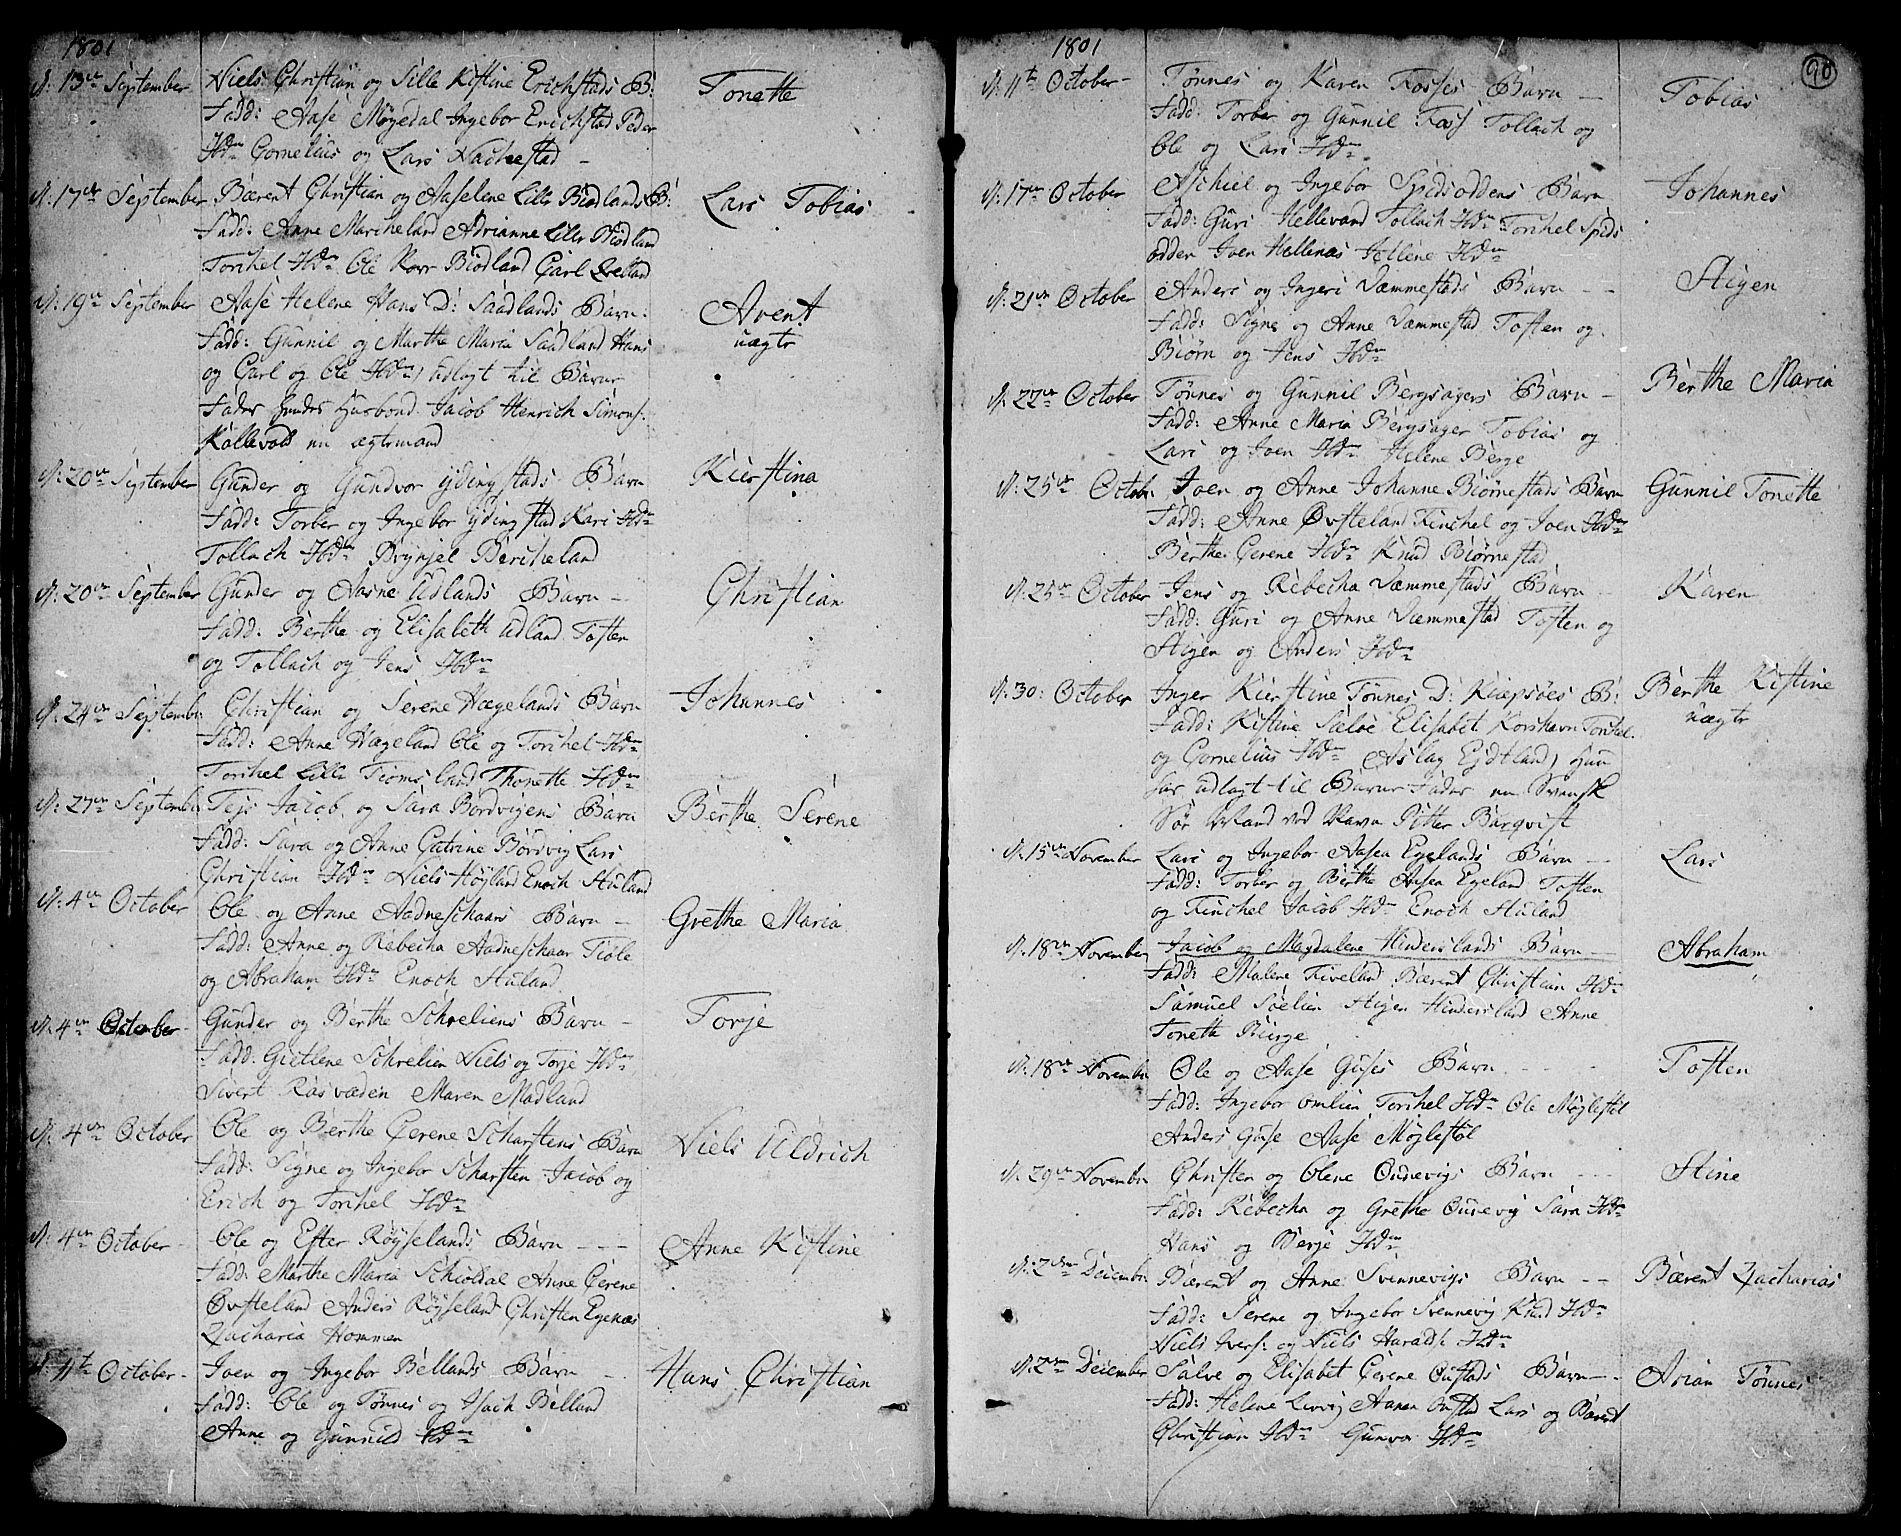 SAK, Lyngdal sokneprestkontor, F/Fa/Fac/L0004: Ministerialbok nr. A 4, 1780-1815, s. 90